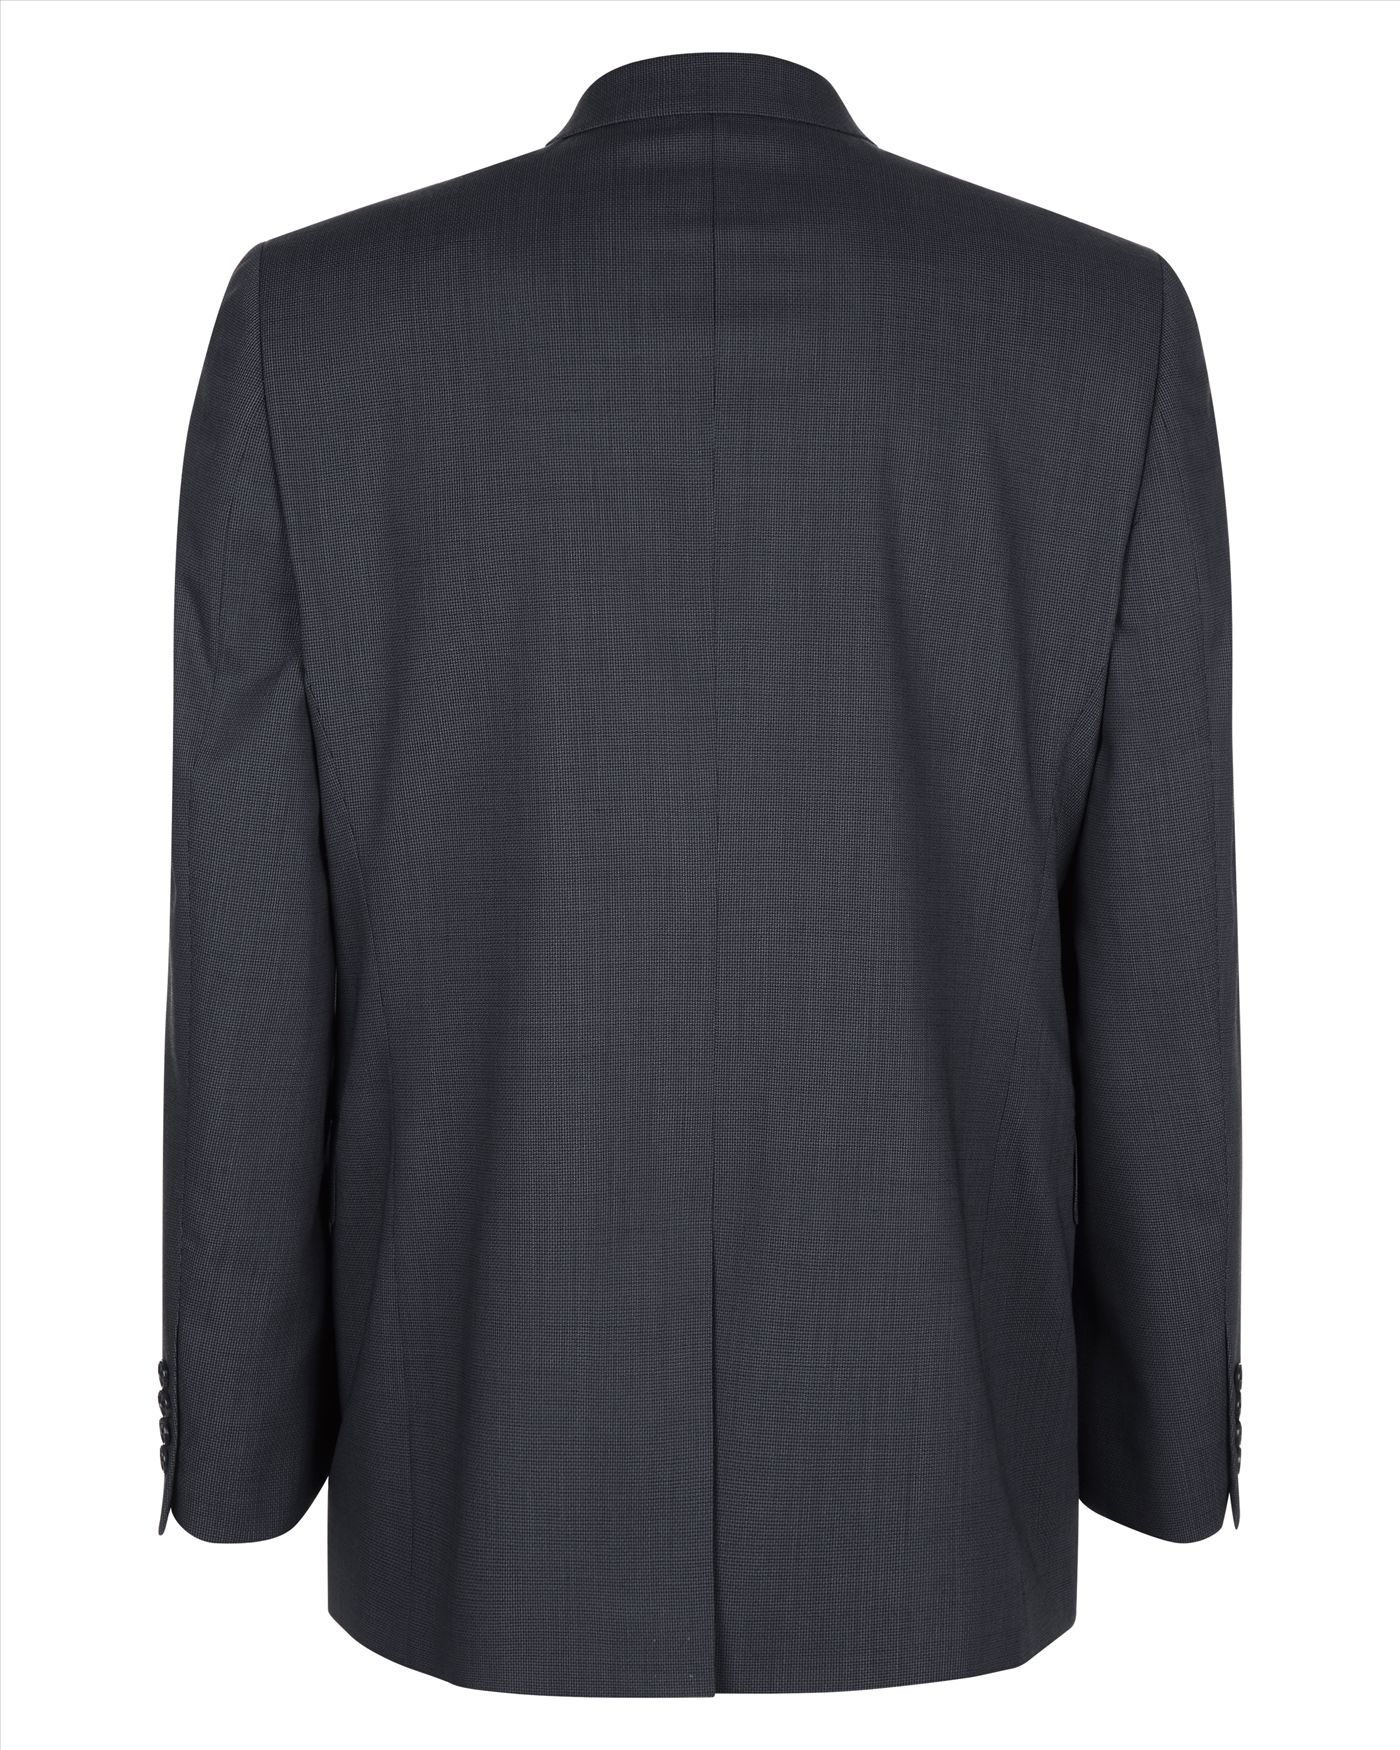 Jaeger Wool Basketweave Modern Jacket in Charcoal (Black) for Men